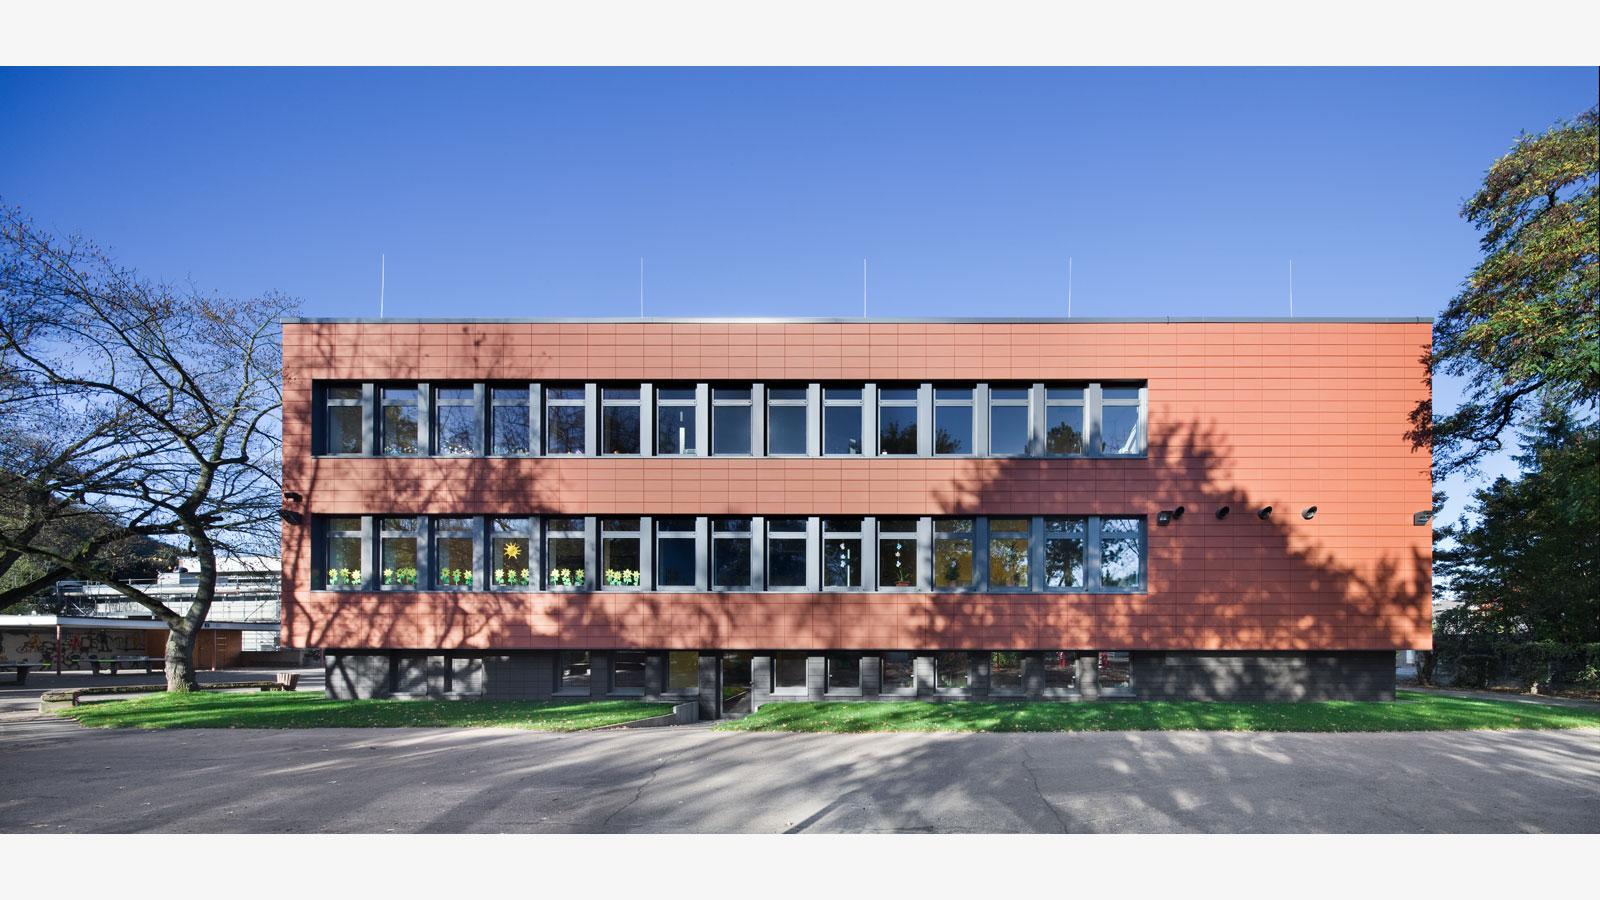 Bodelschwinghschule Friesdorf Energetische Modernisierung Bodelschwinghschule, , Koenigs Rütter Architket